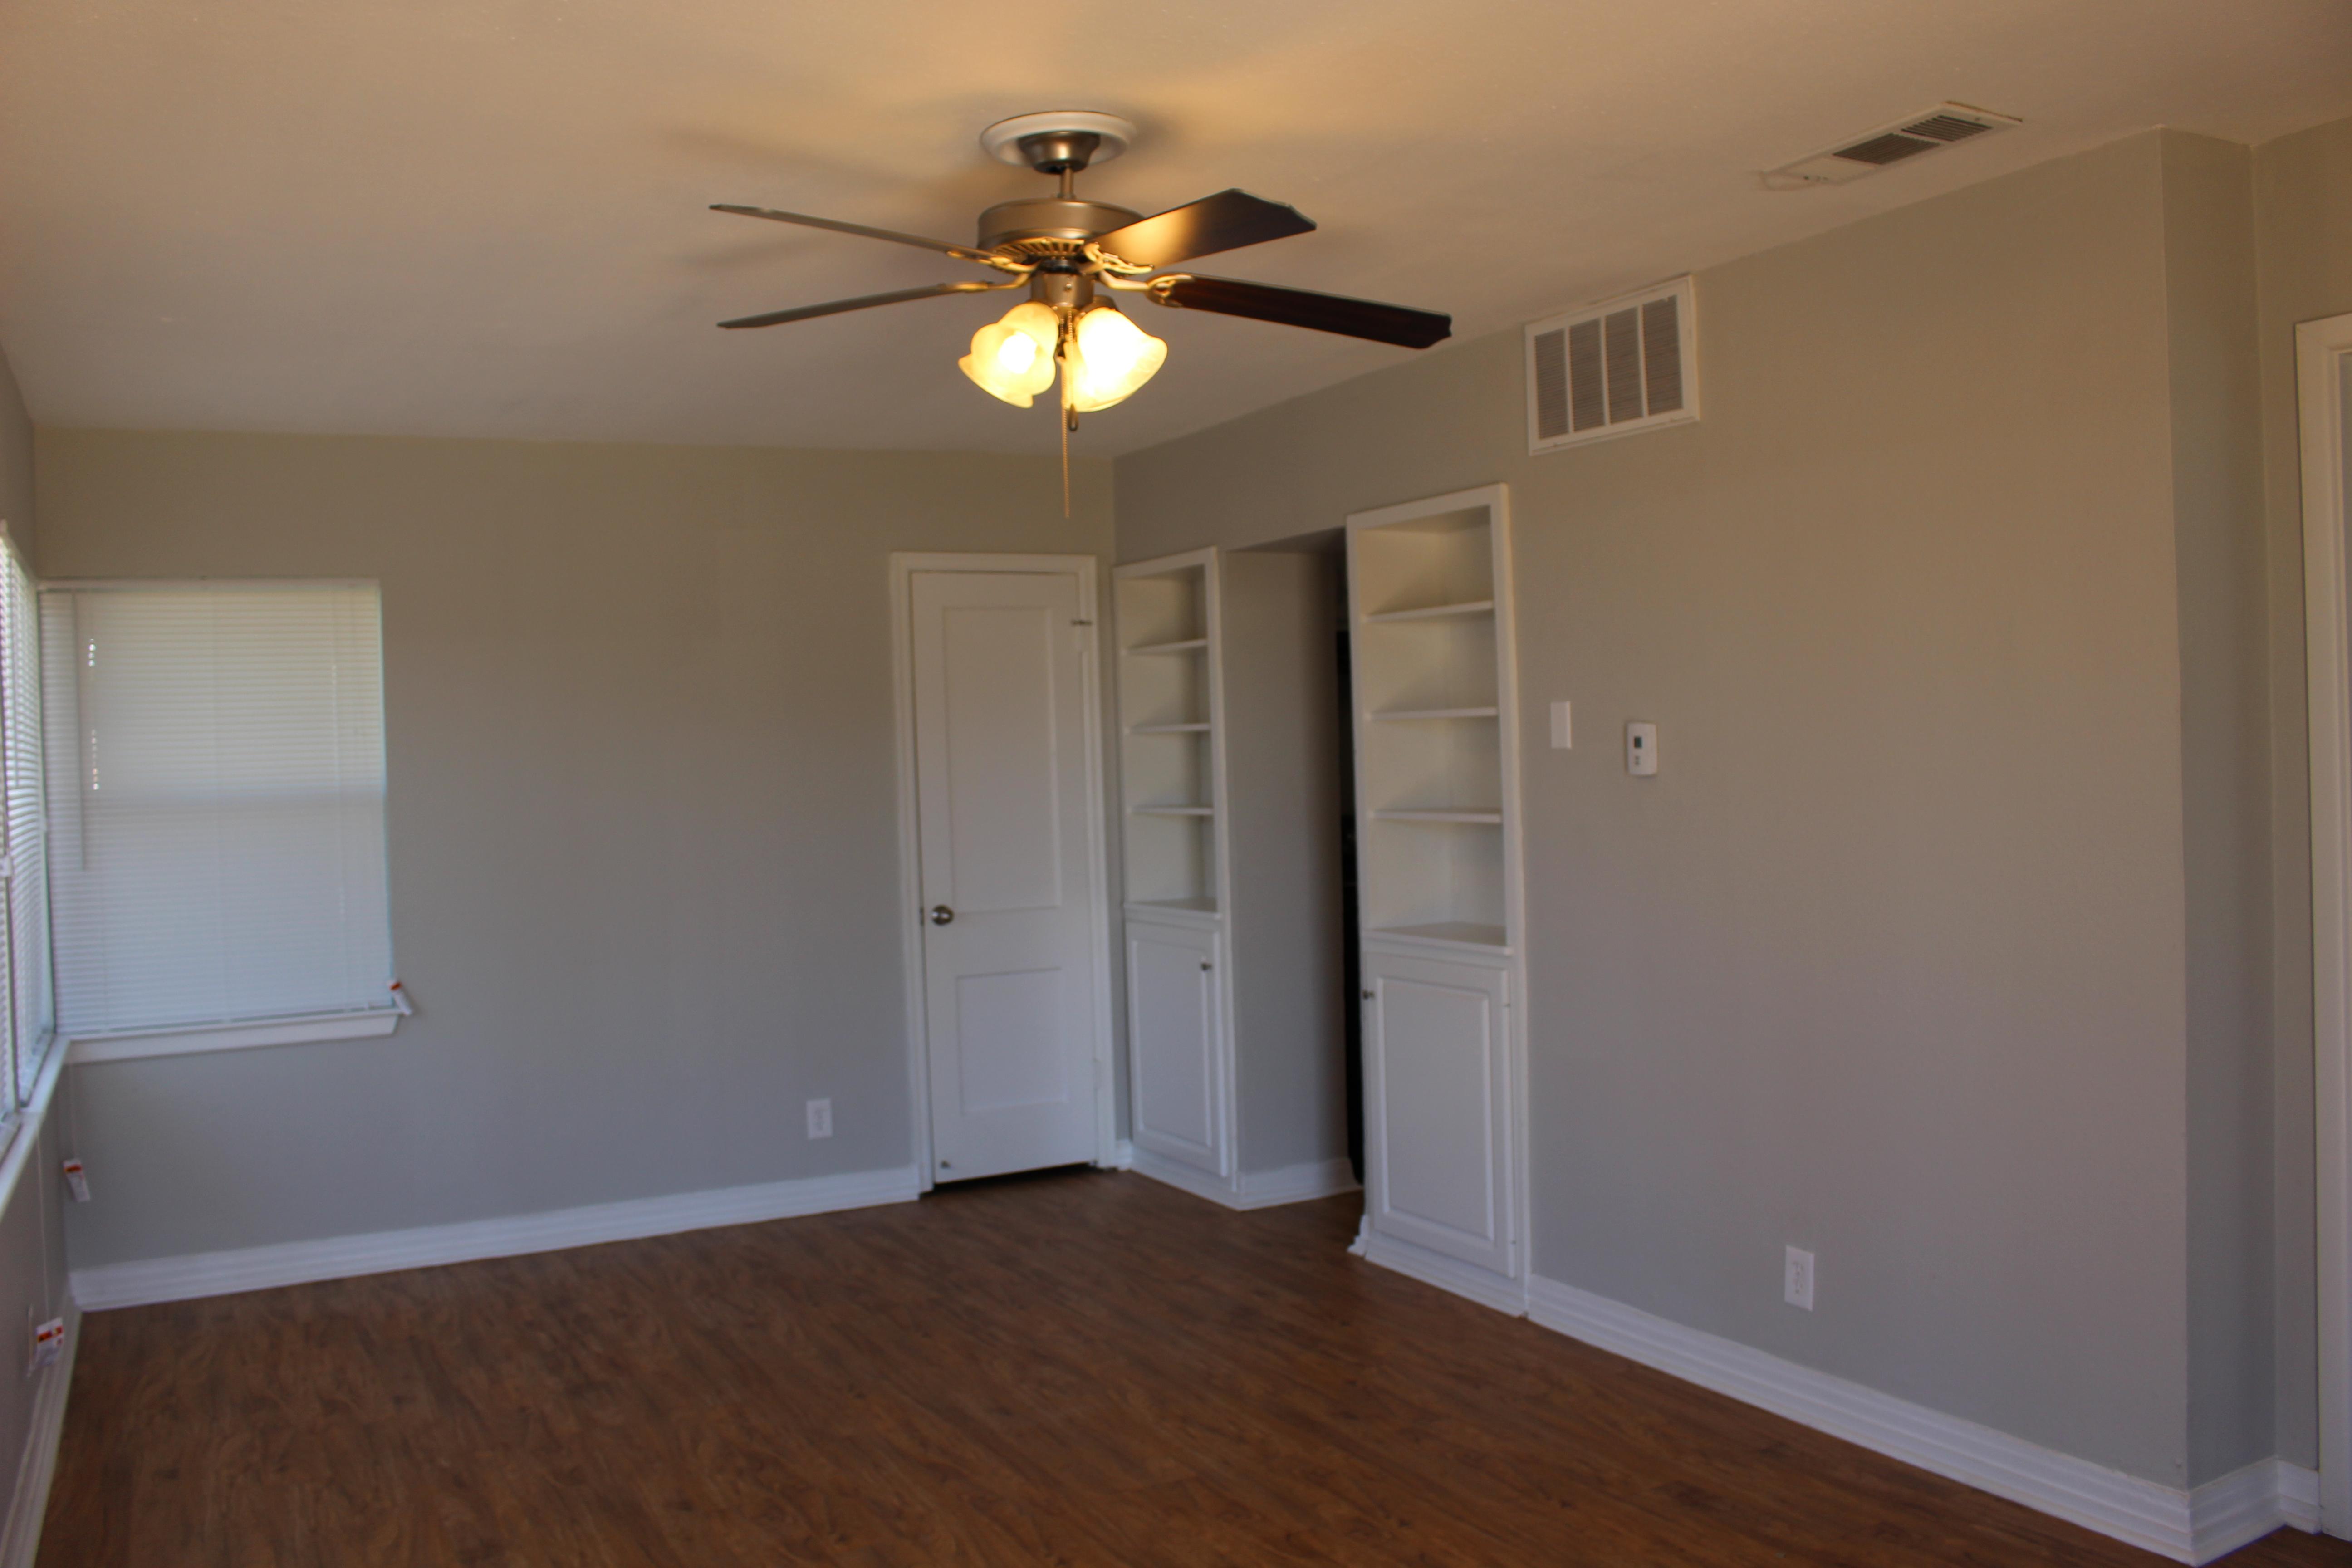 Boston Creek Apartments 2701 44th St Lubbock Tx 79413